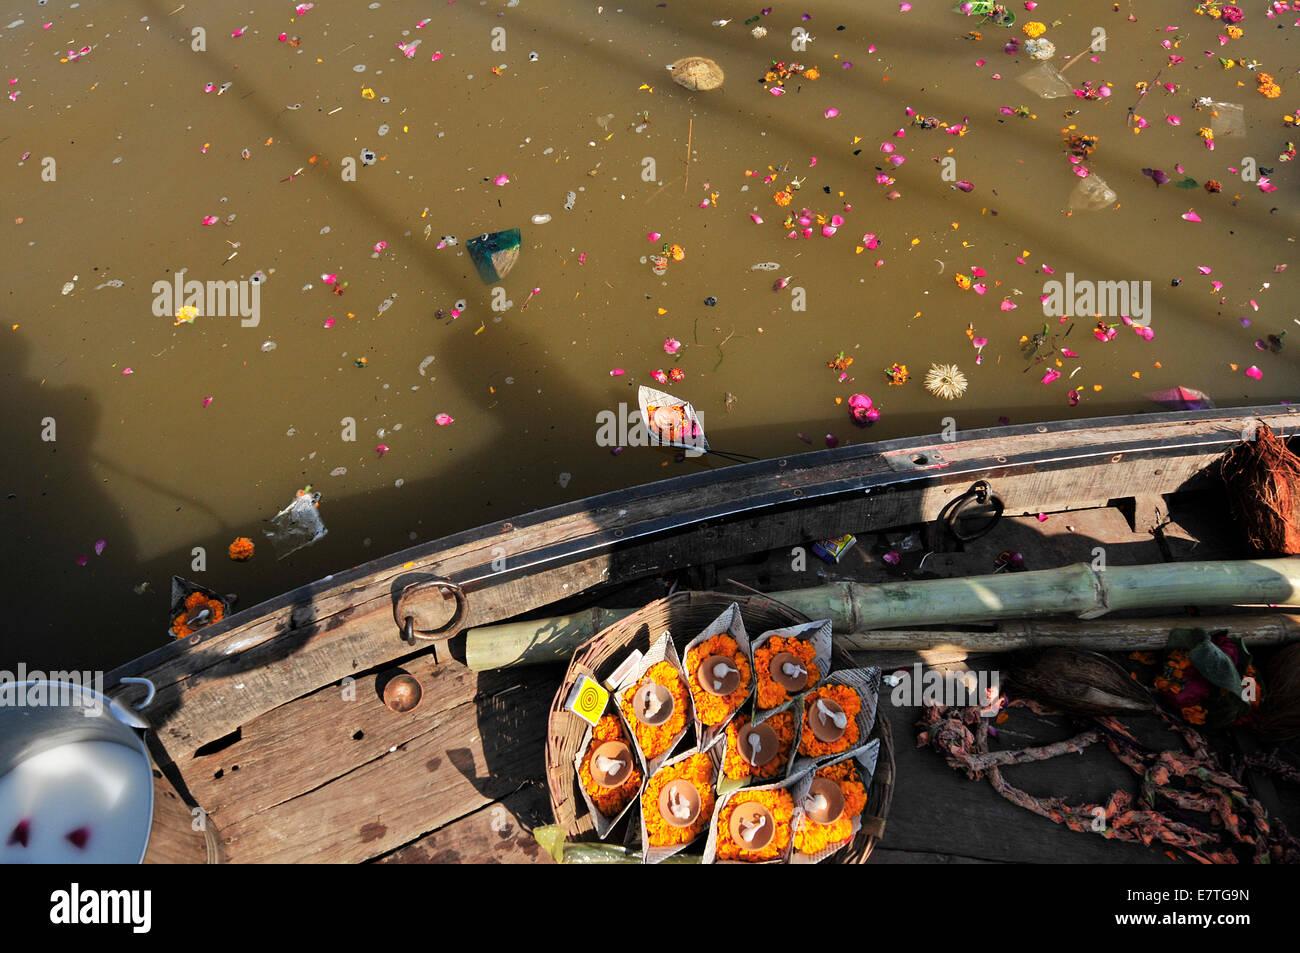 Colors, Water, Women, child, River, India, Ganges River, soul, folk fest, khumb mela 2013, boats - Stock Image